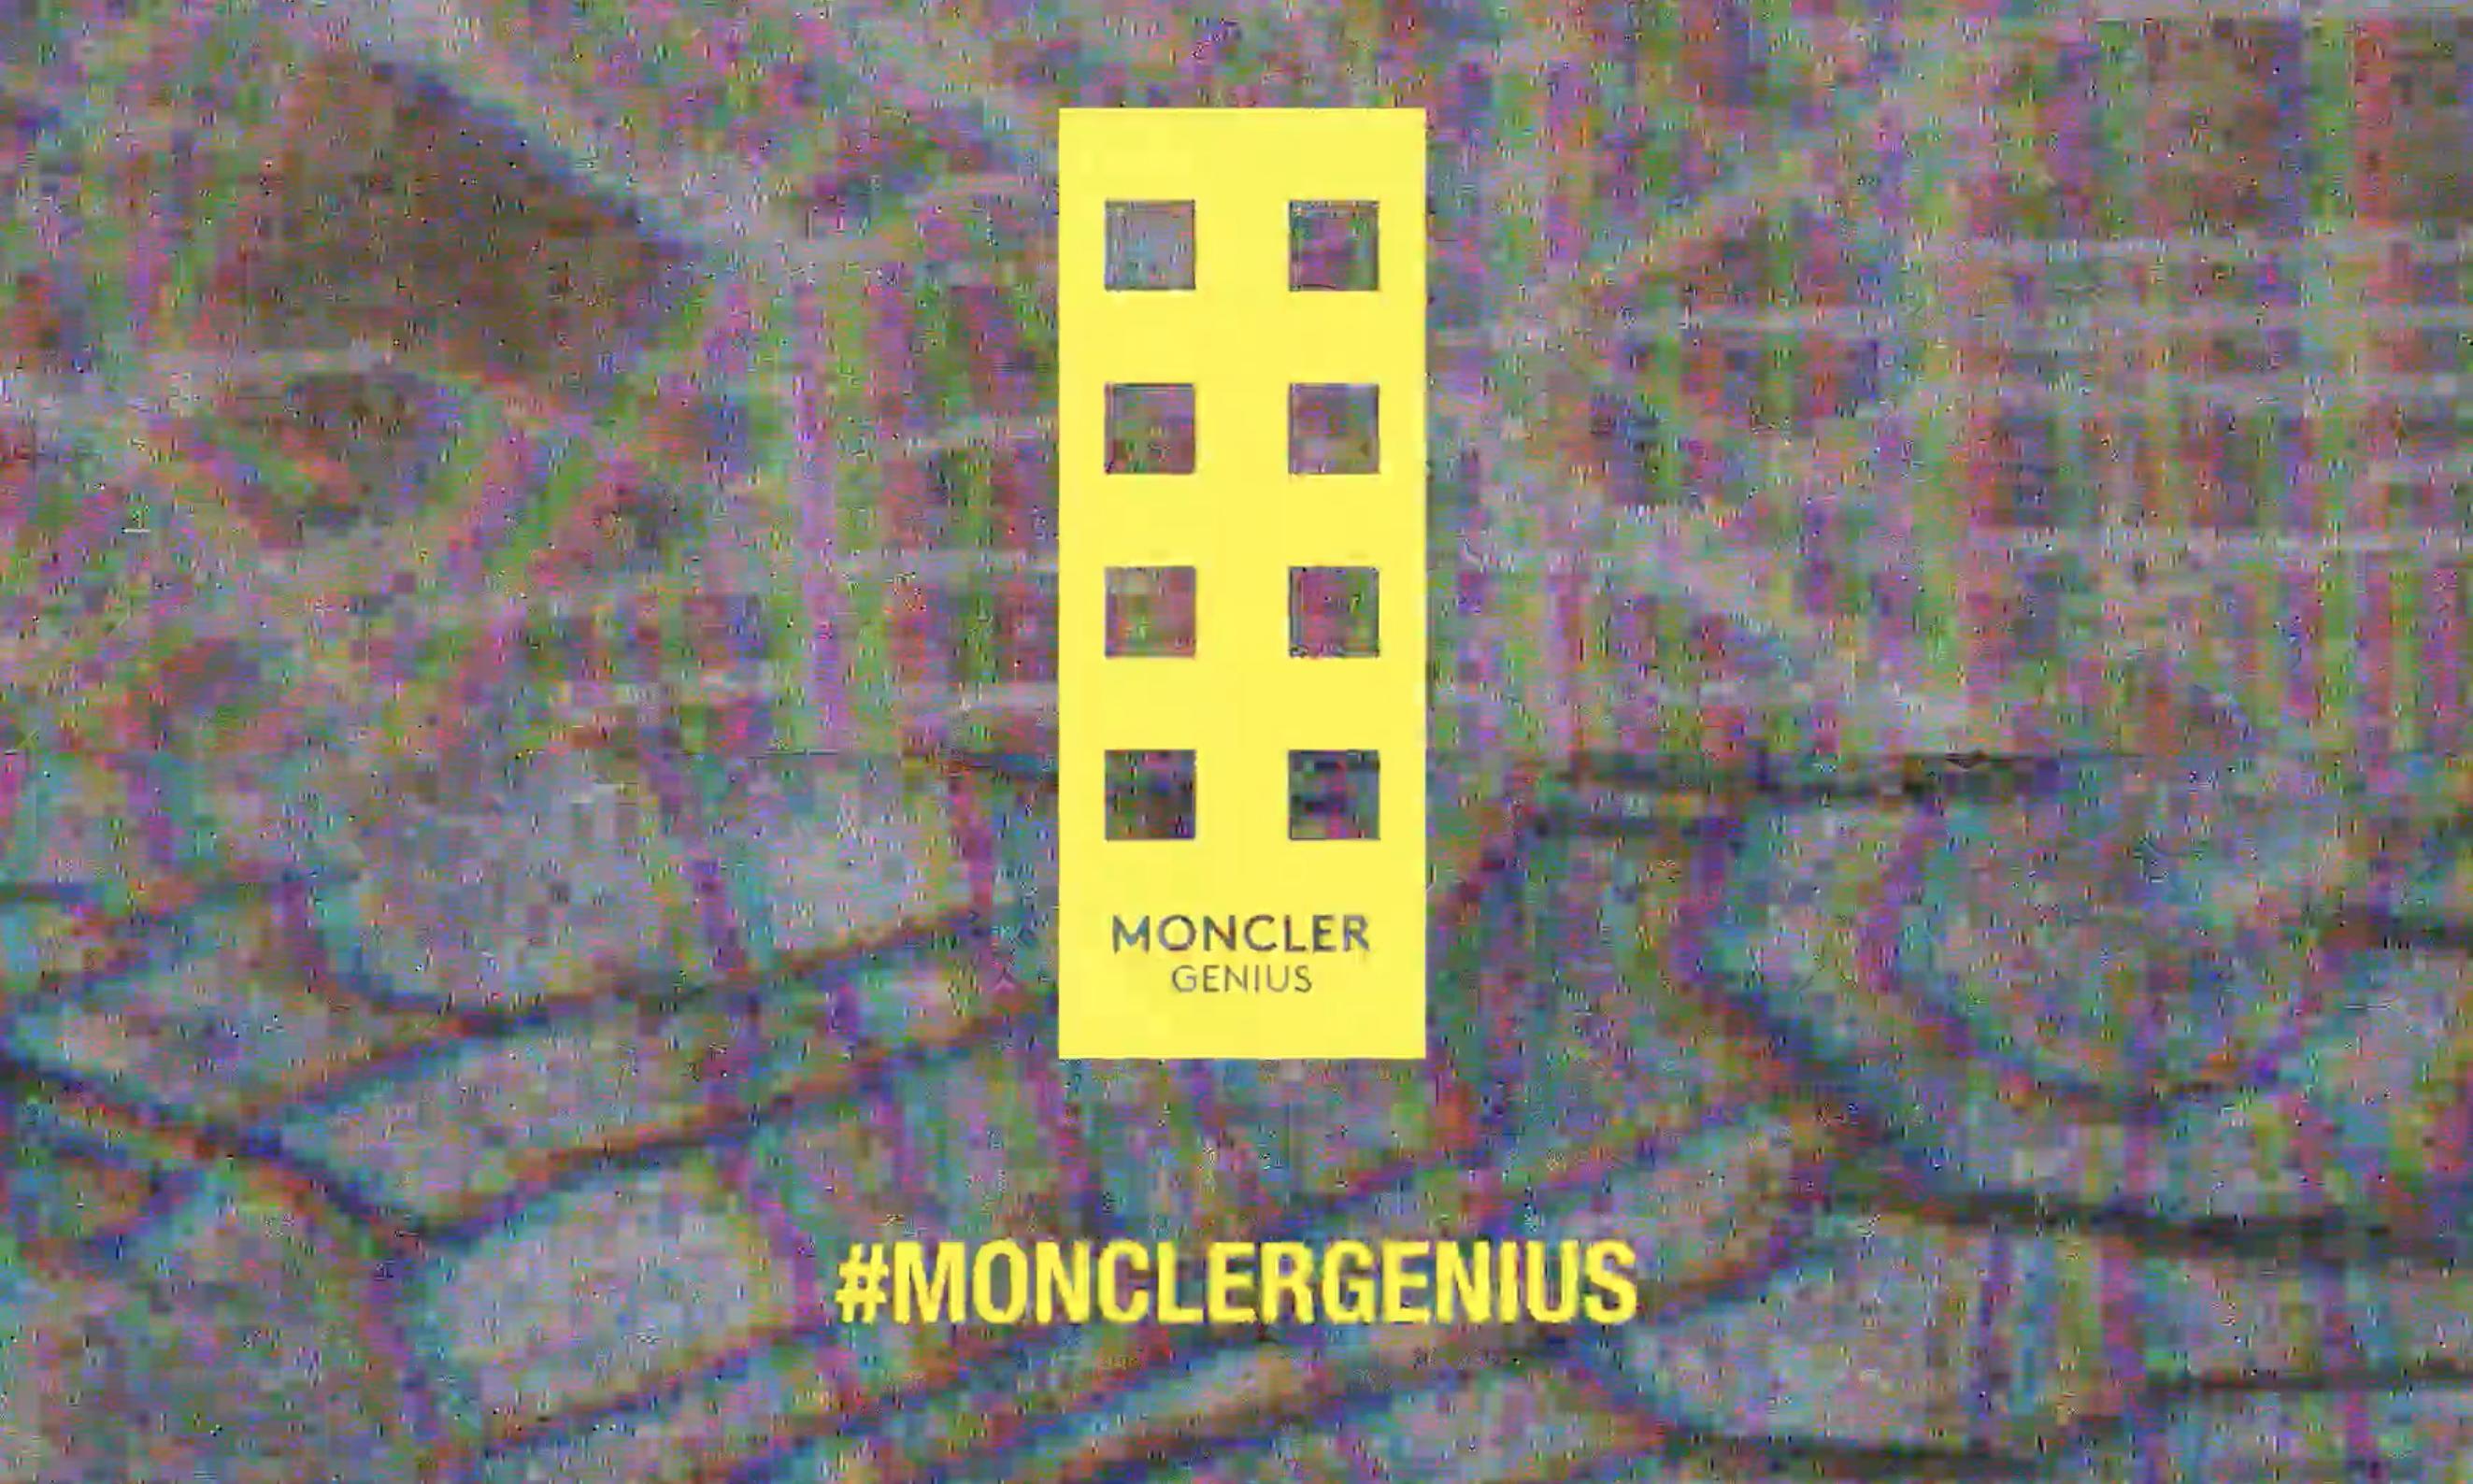 Moncler Genius 企划第二季将在米兰公布合作设计师